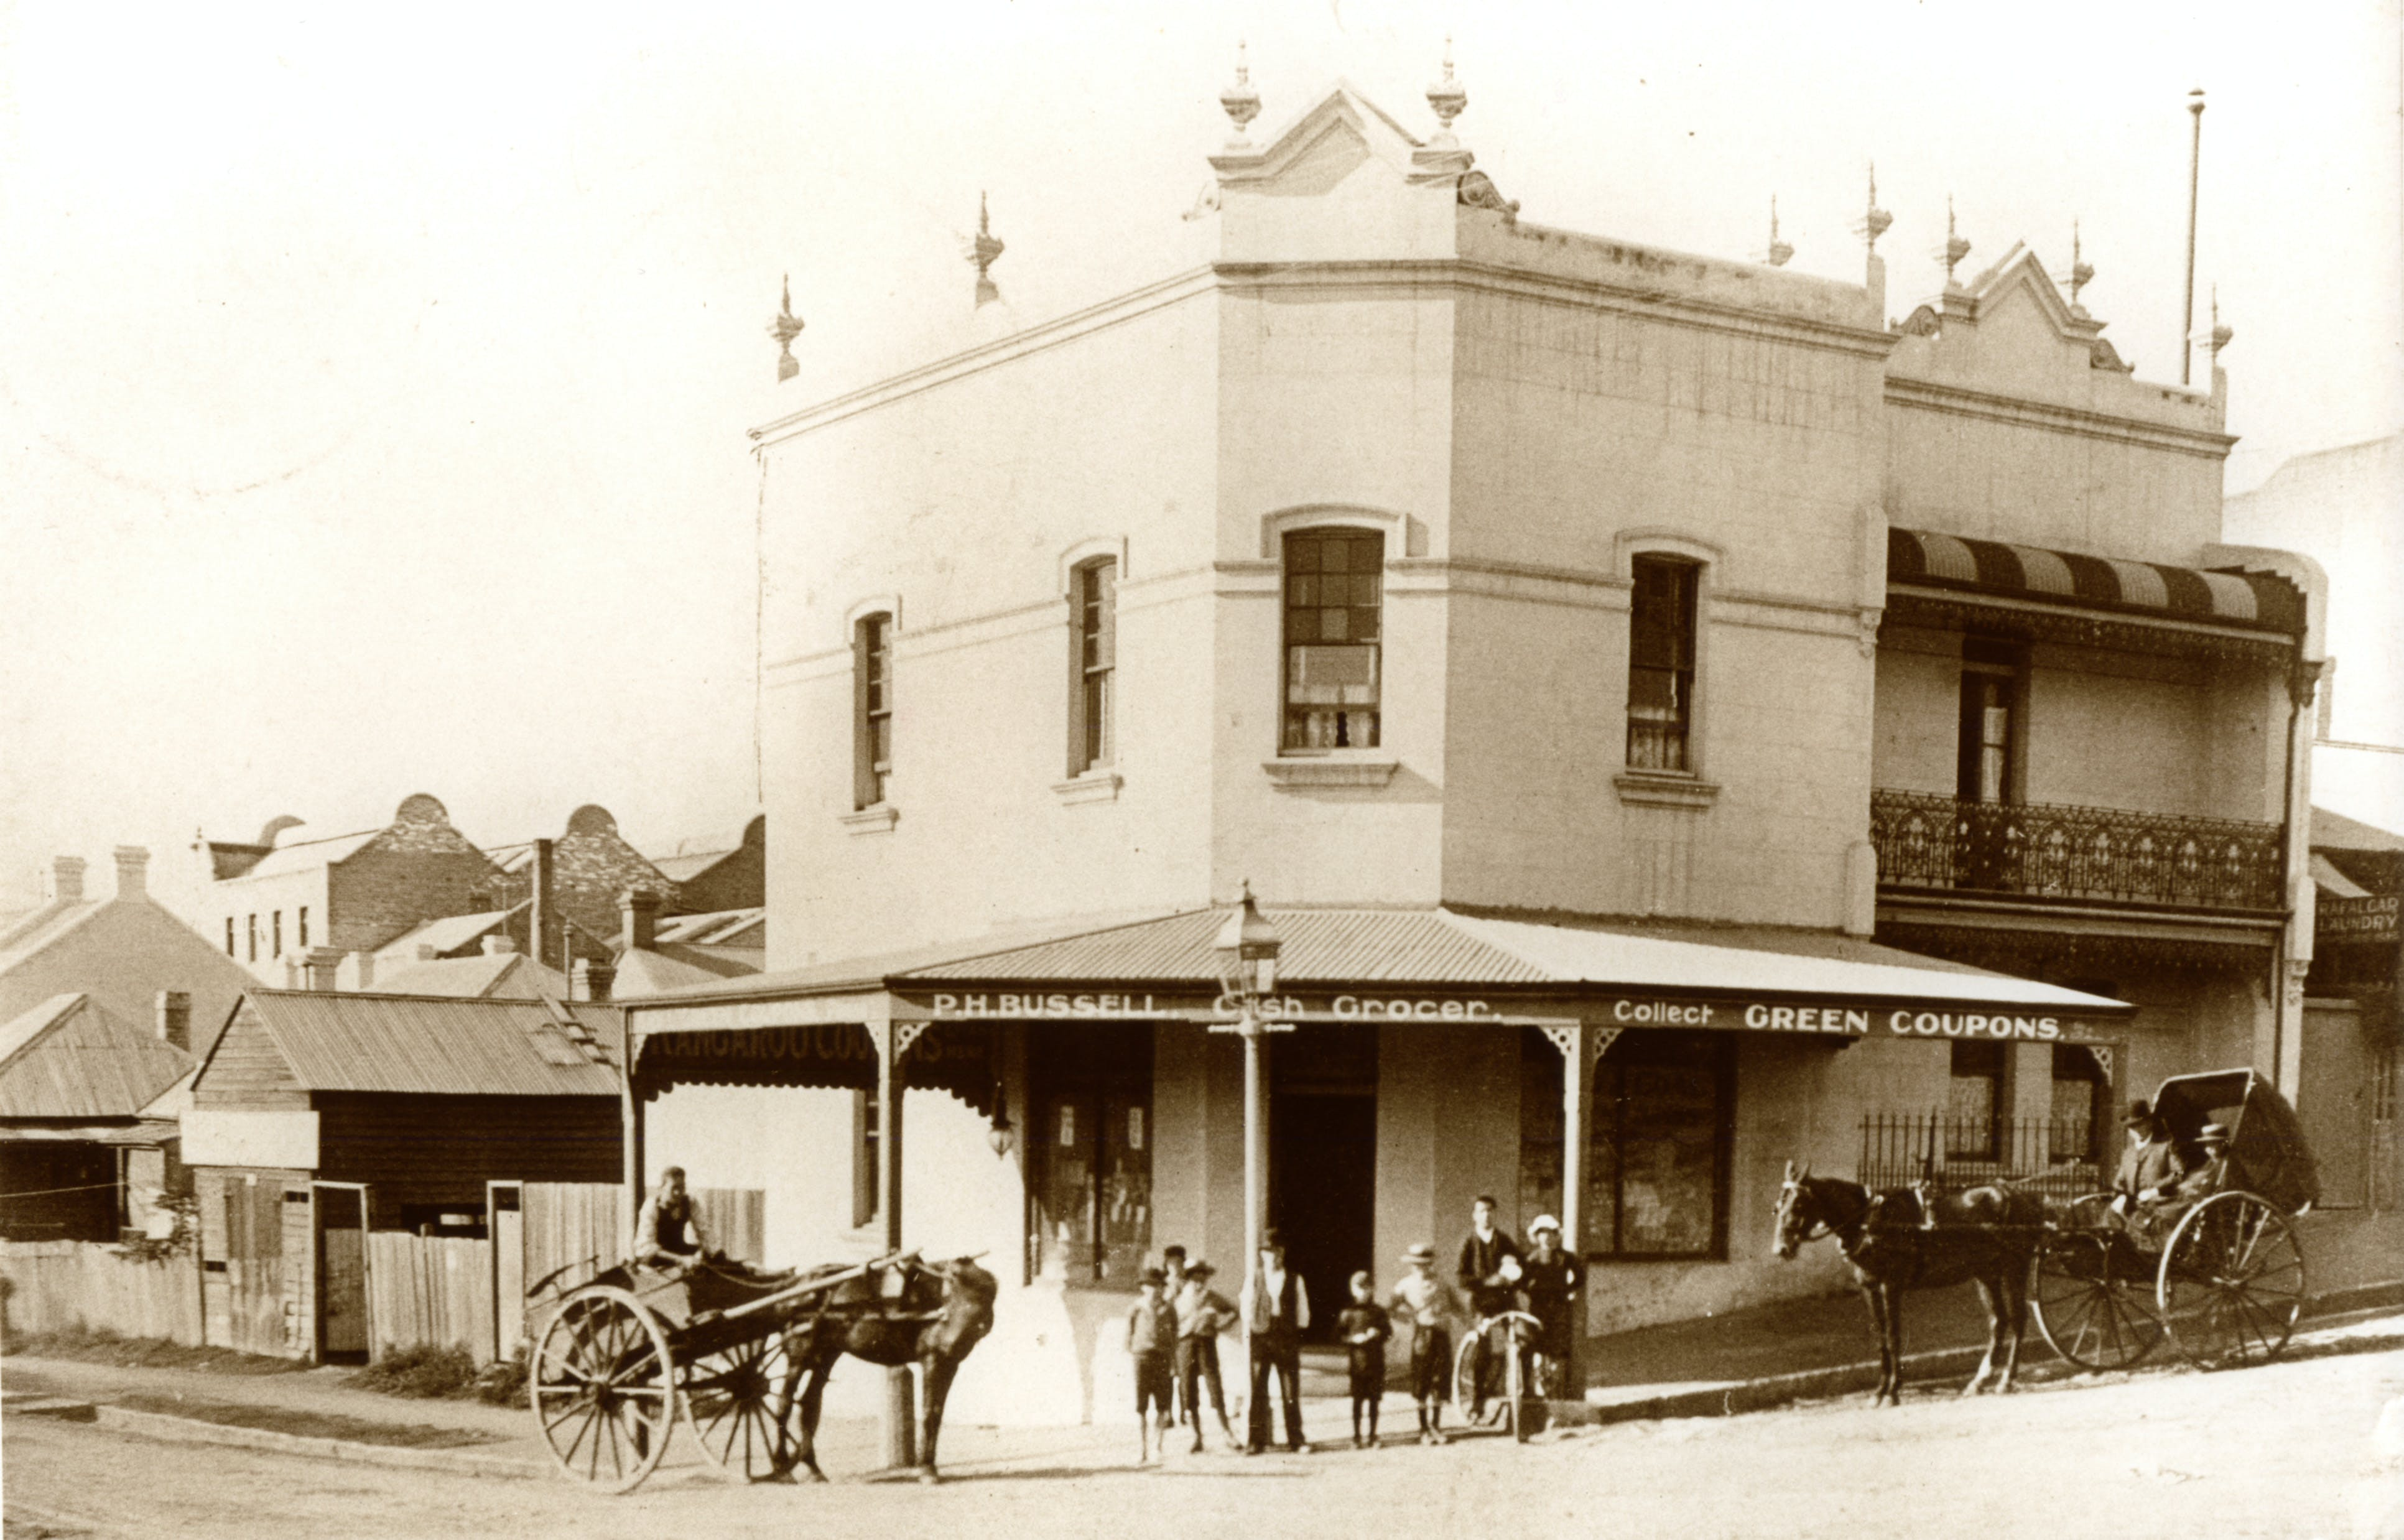 P H Bussell 1895, 127 Trafalgar Street, Annandale